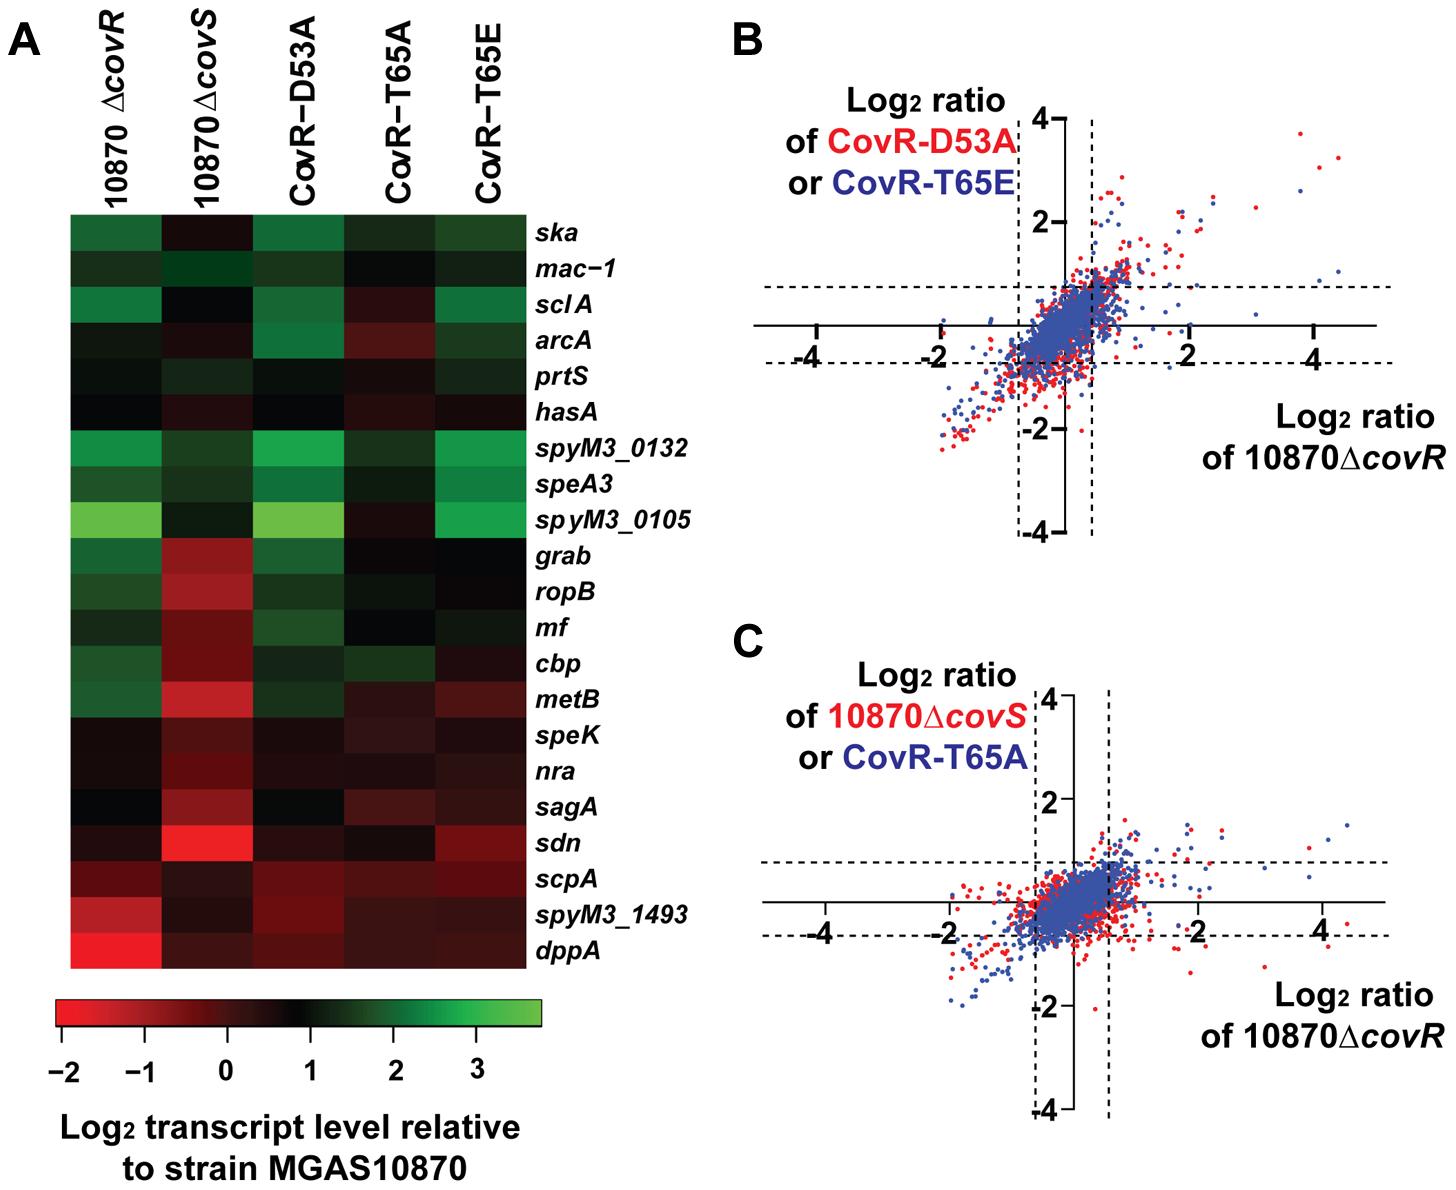 RNA-Seq analysis of various GAS strains.